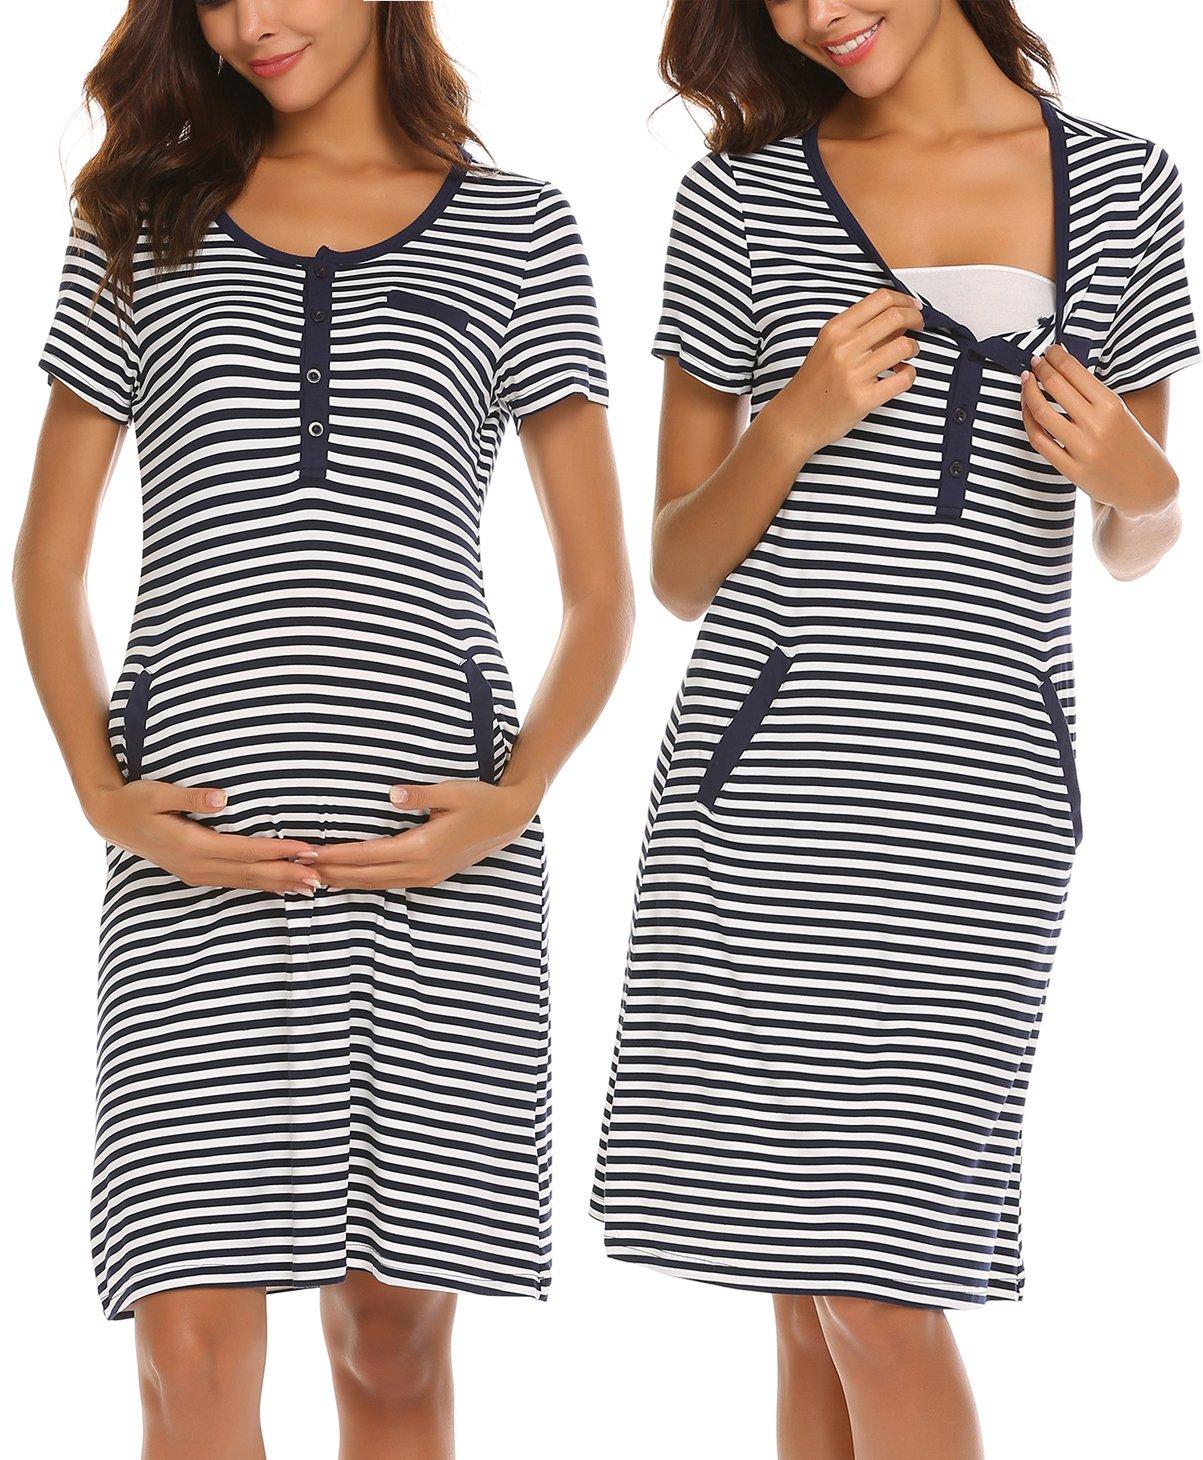 6a49dffc06150 Ekouaer 100% Cotton Maternity Sleepwear Nursing Dress Breastfeeding Night  Shirt Tops for Women